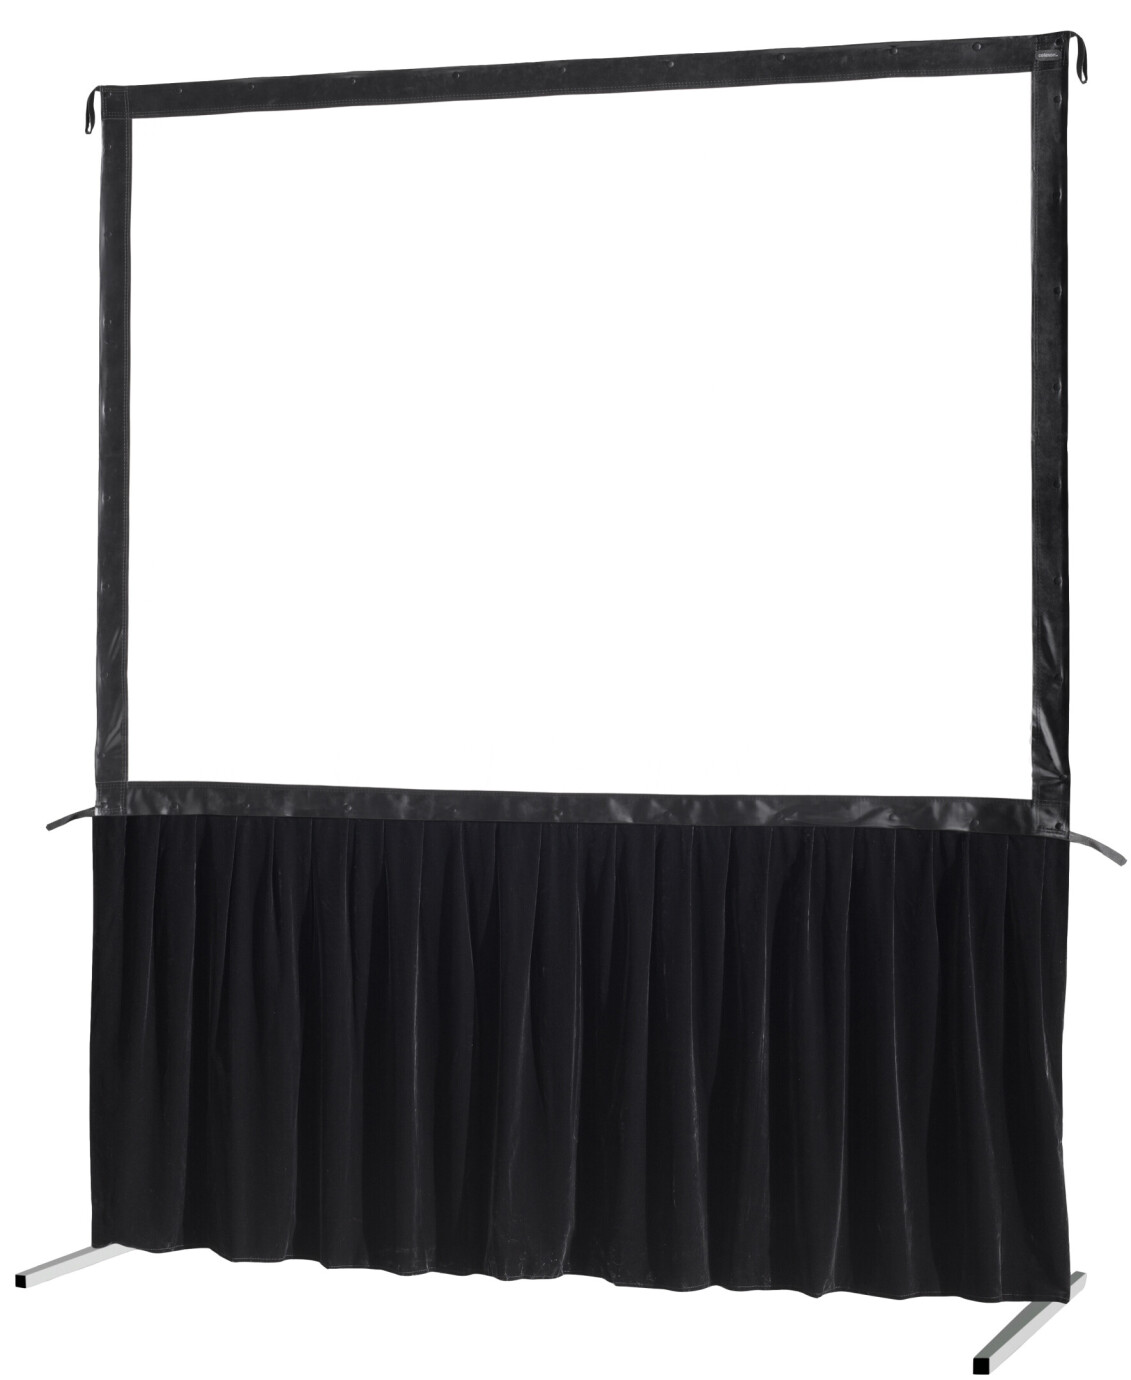 celexon Vorhangset 1-seitig für Faltrahmenleinwand Mobil Expert 406 x 228 cm